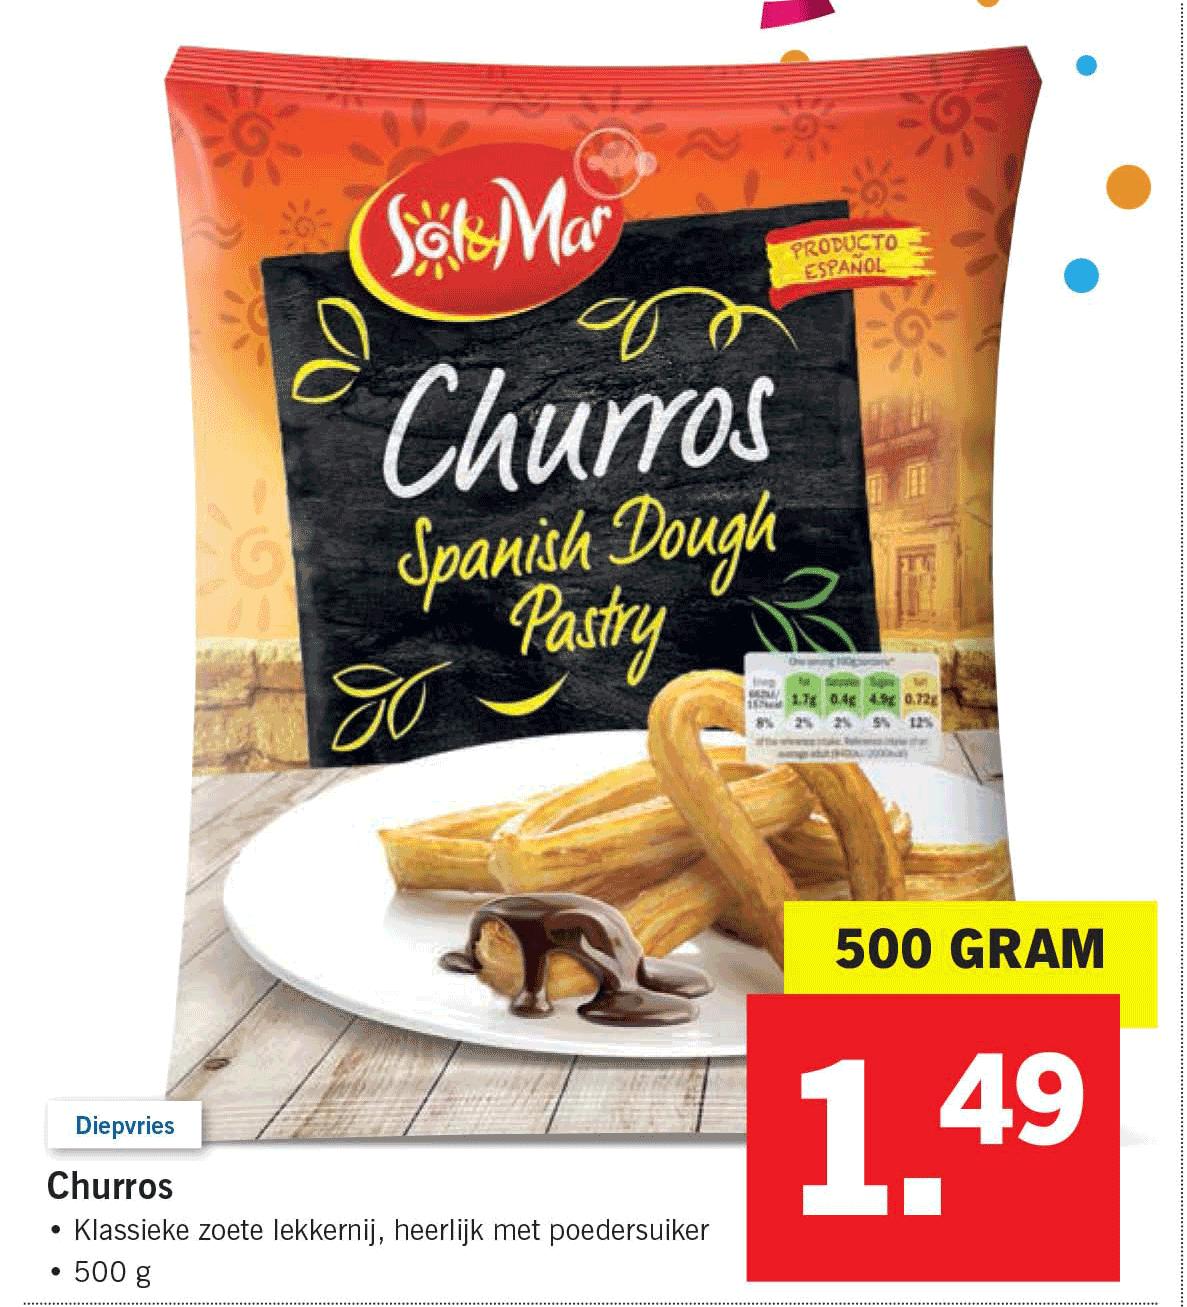 Lidl Churros